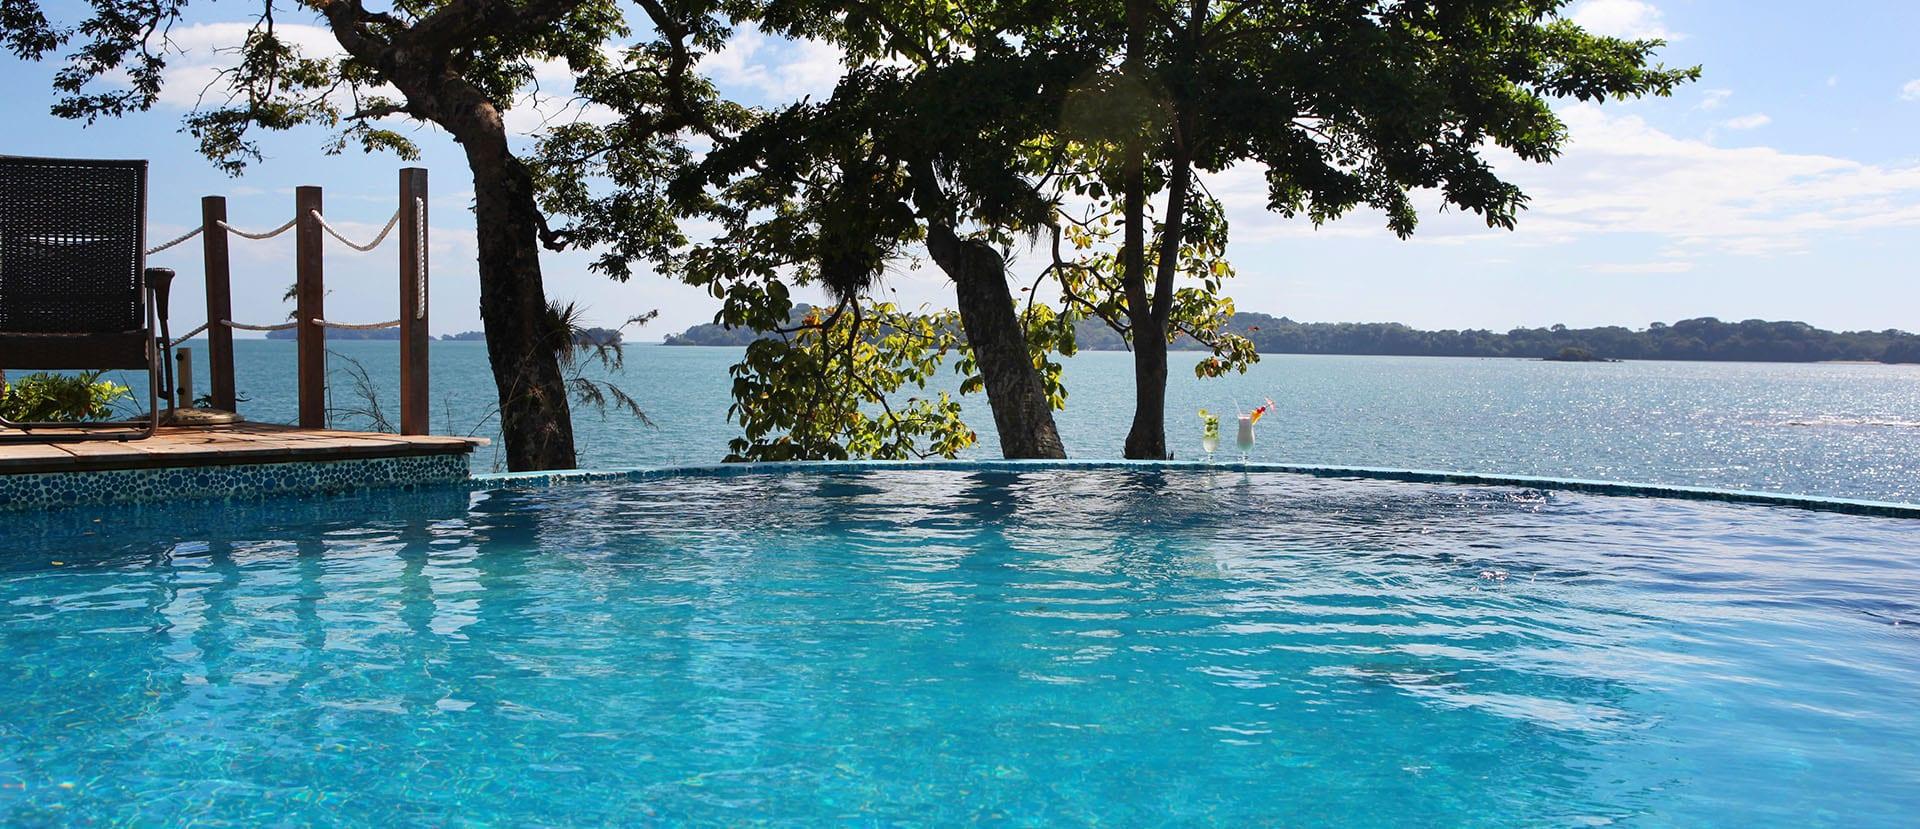 Panama oceanside pool